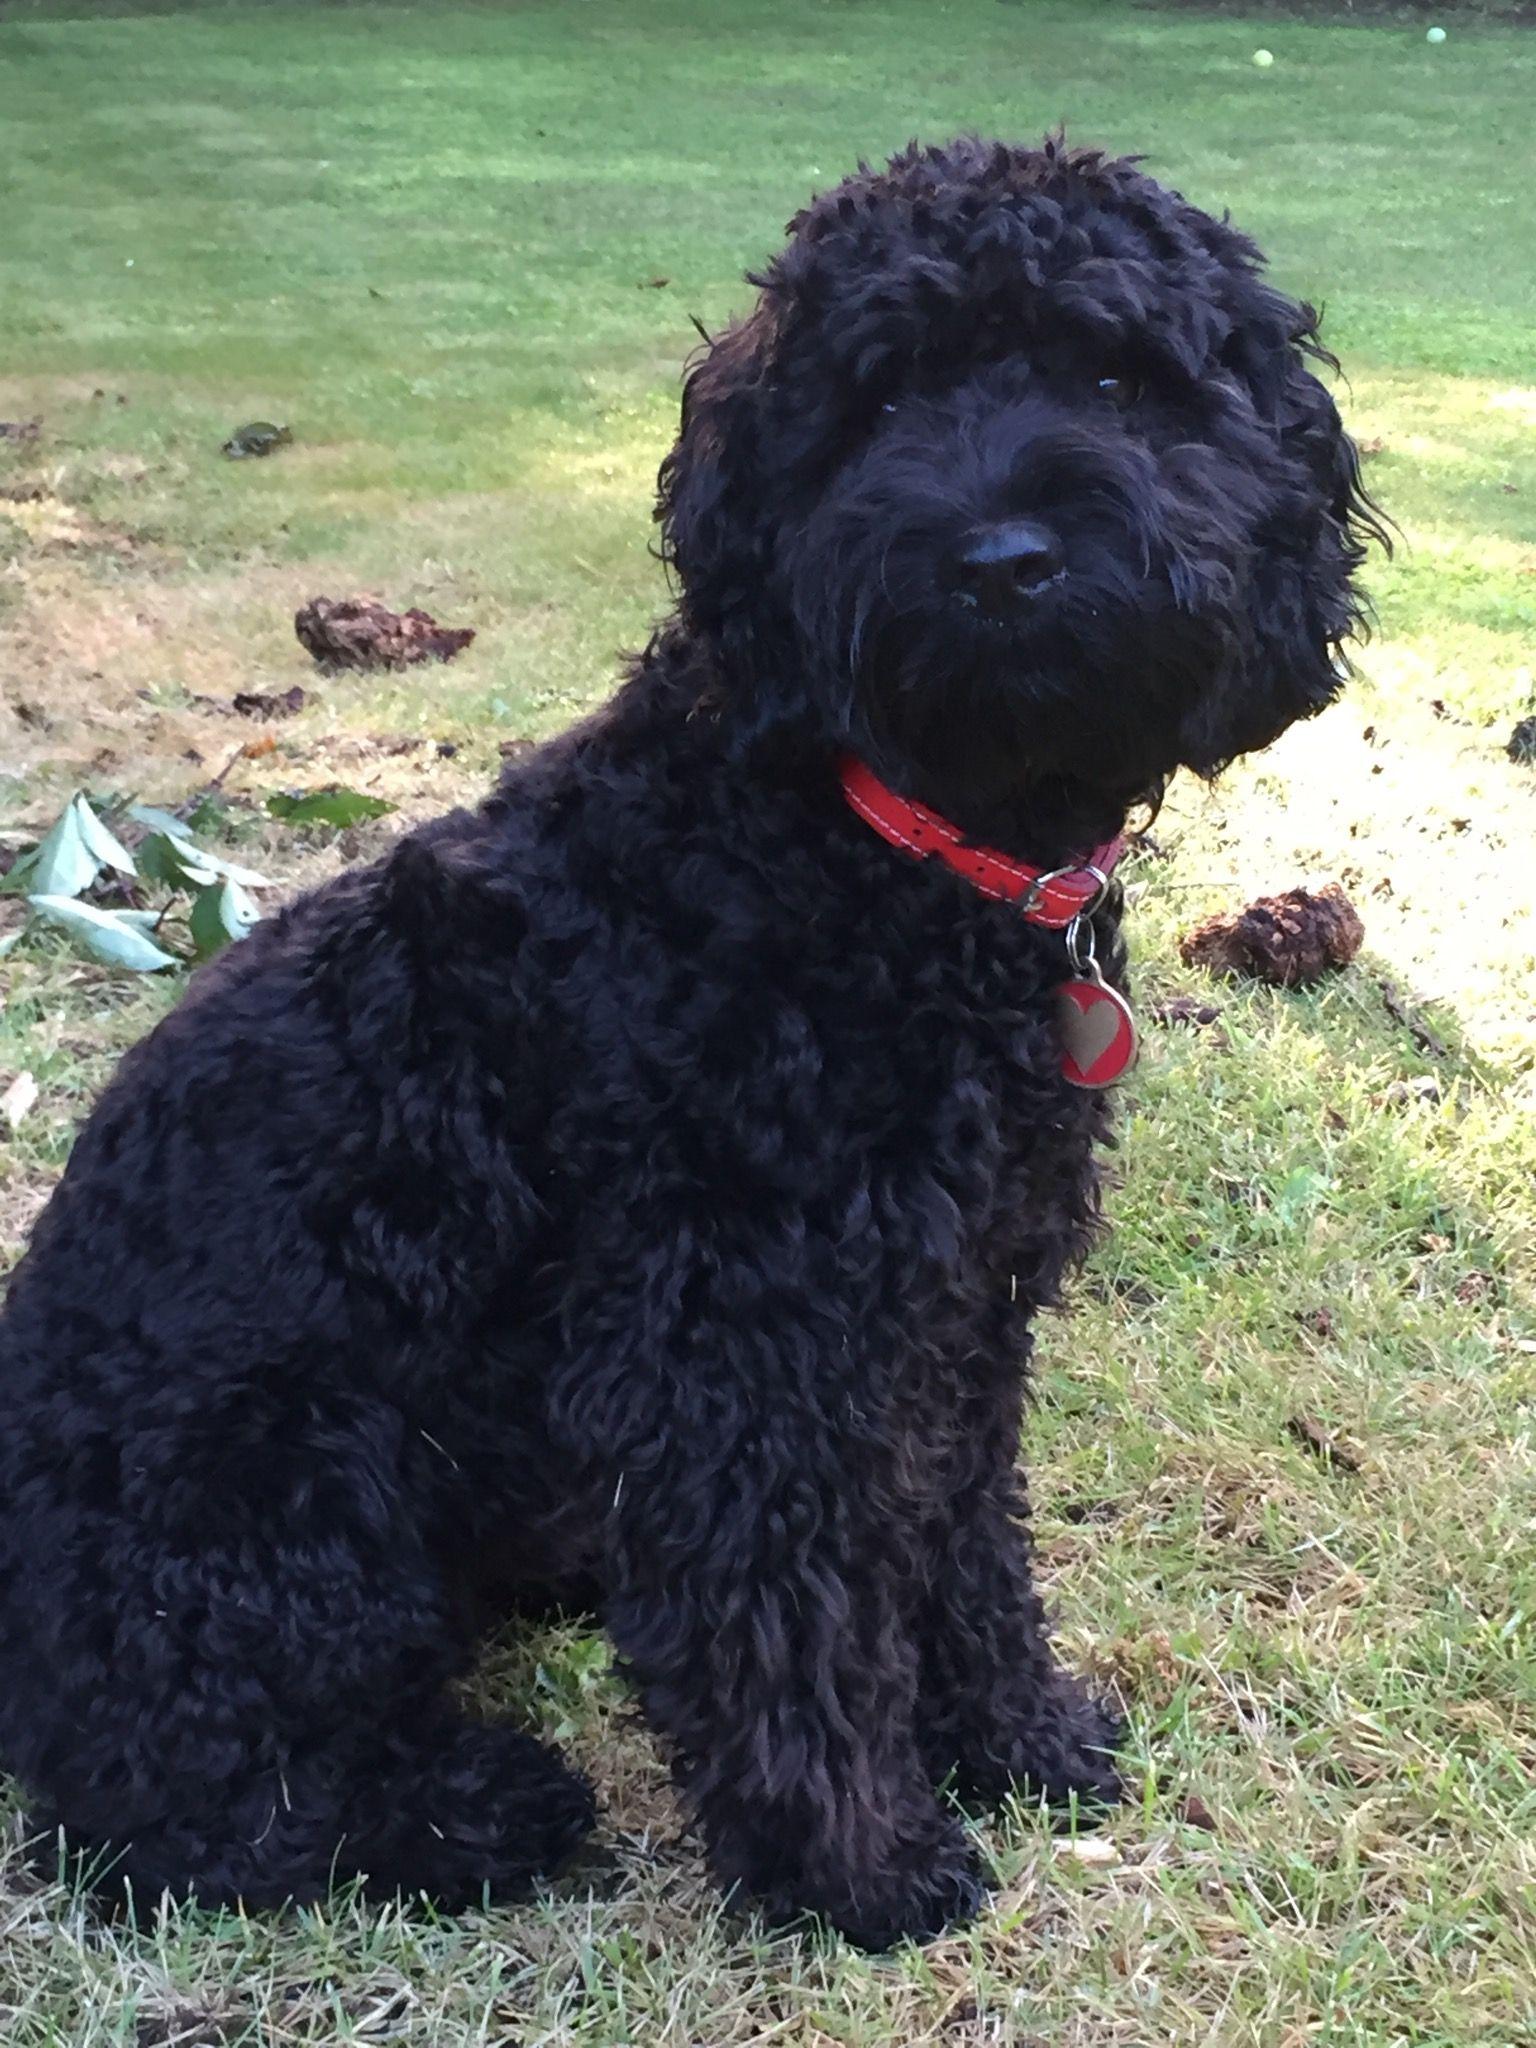 Sybil Our 9 Month Adorable Cockerpoo Black Cockapoo Cockapoo Grooming Dog Pounds